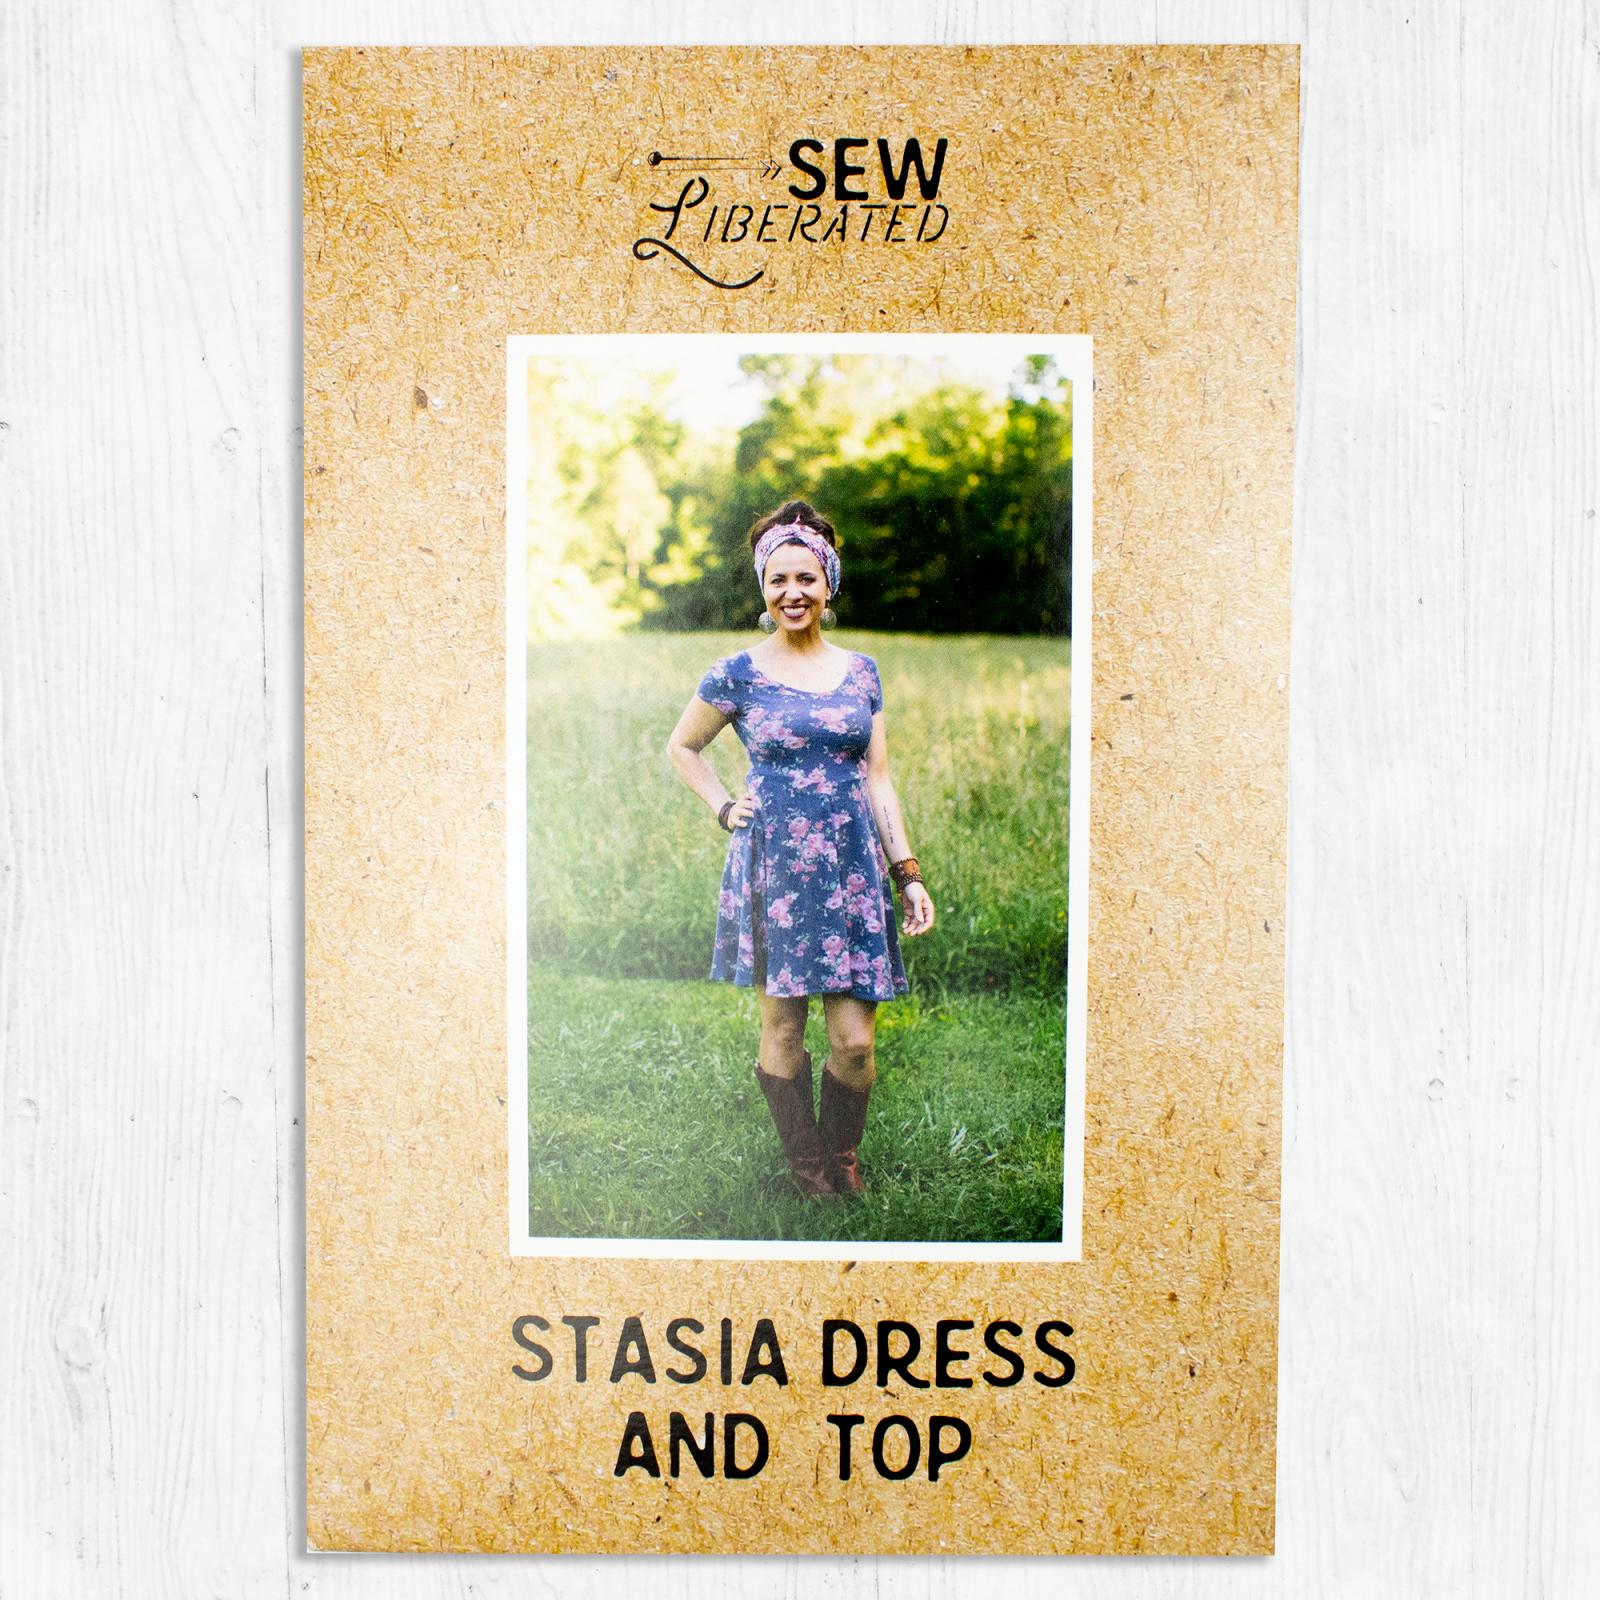 Sew Liberated - Stasia Dress